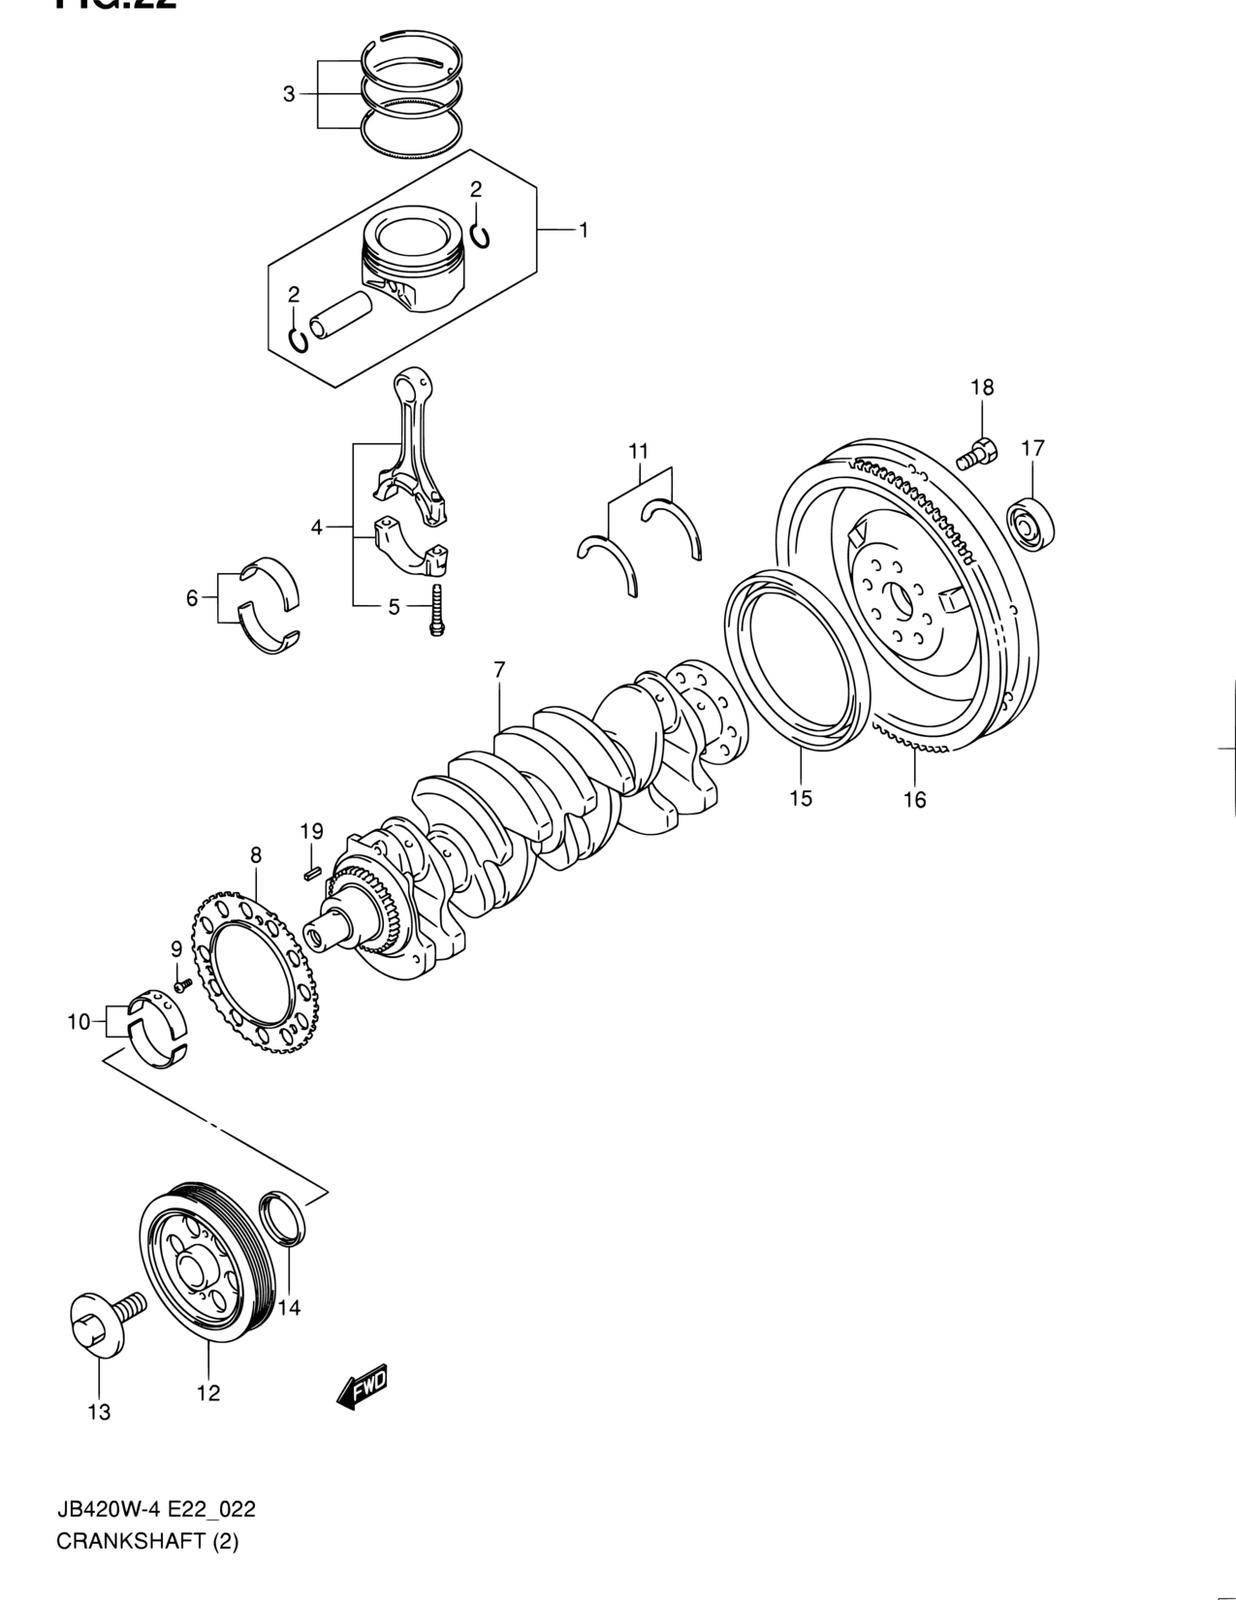 Crankshaft Pulley for Suzuki Grand Vitara 2009-2013 2.4L